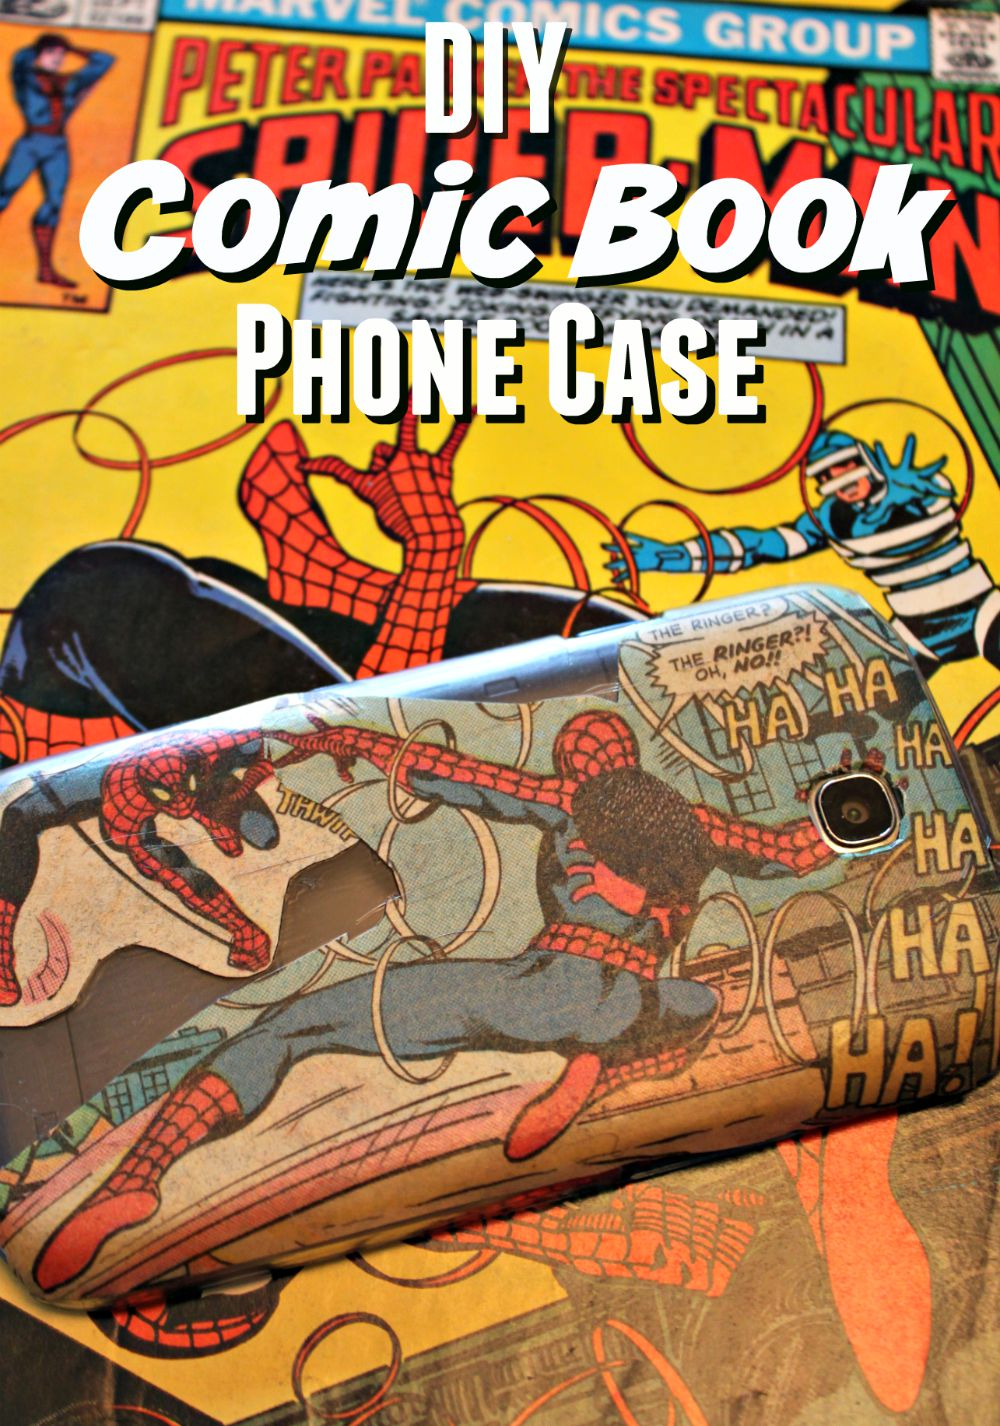 Phone Book Cover Diy : Diy comic book phone case cover the neighborhood moms